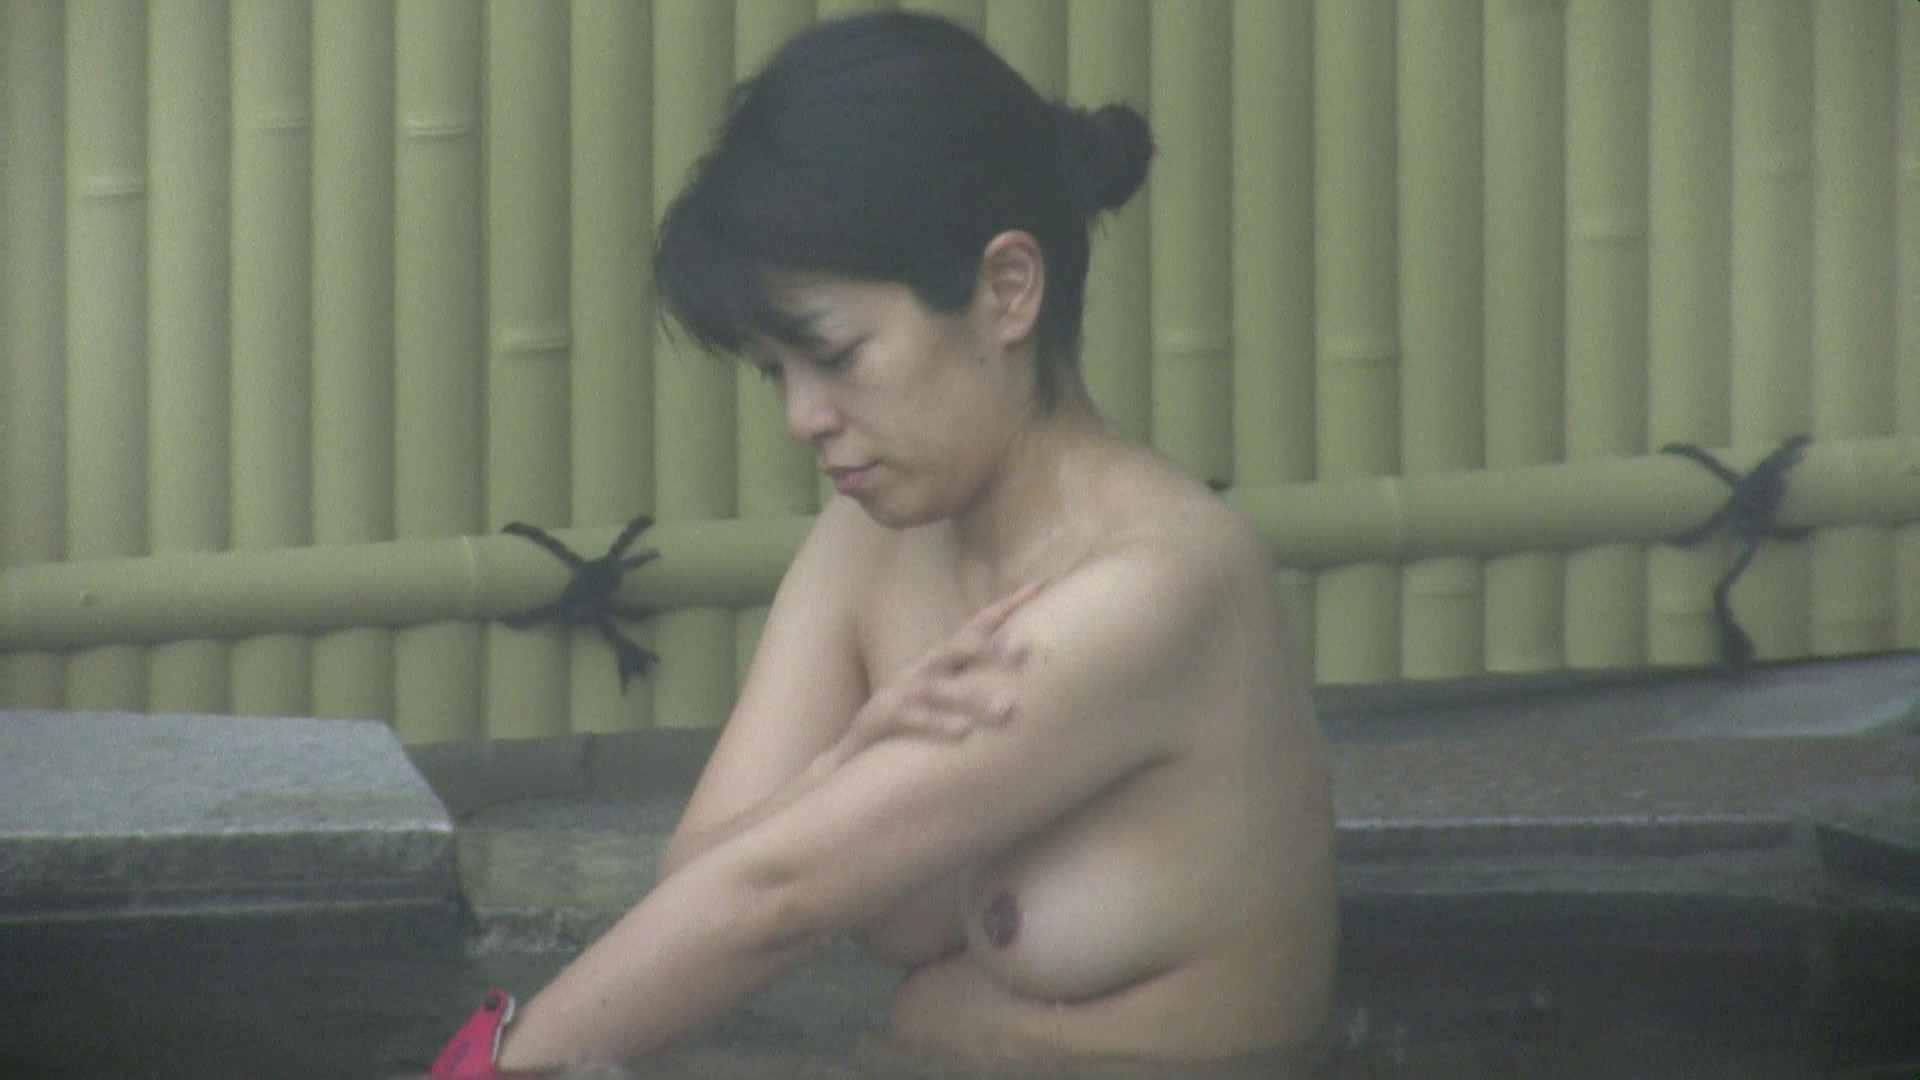 Aquaな露天風呂Vol.585 露天 アダルト動画キャプチャ 78PICs 35